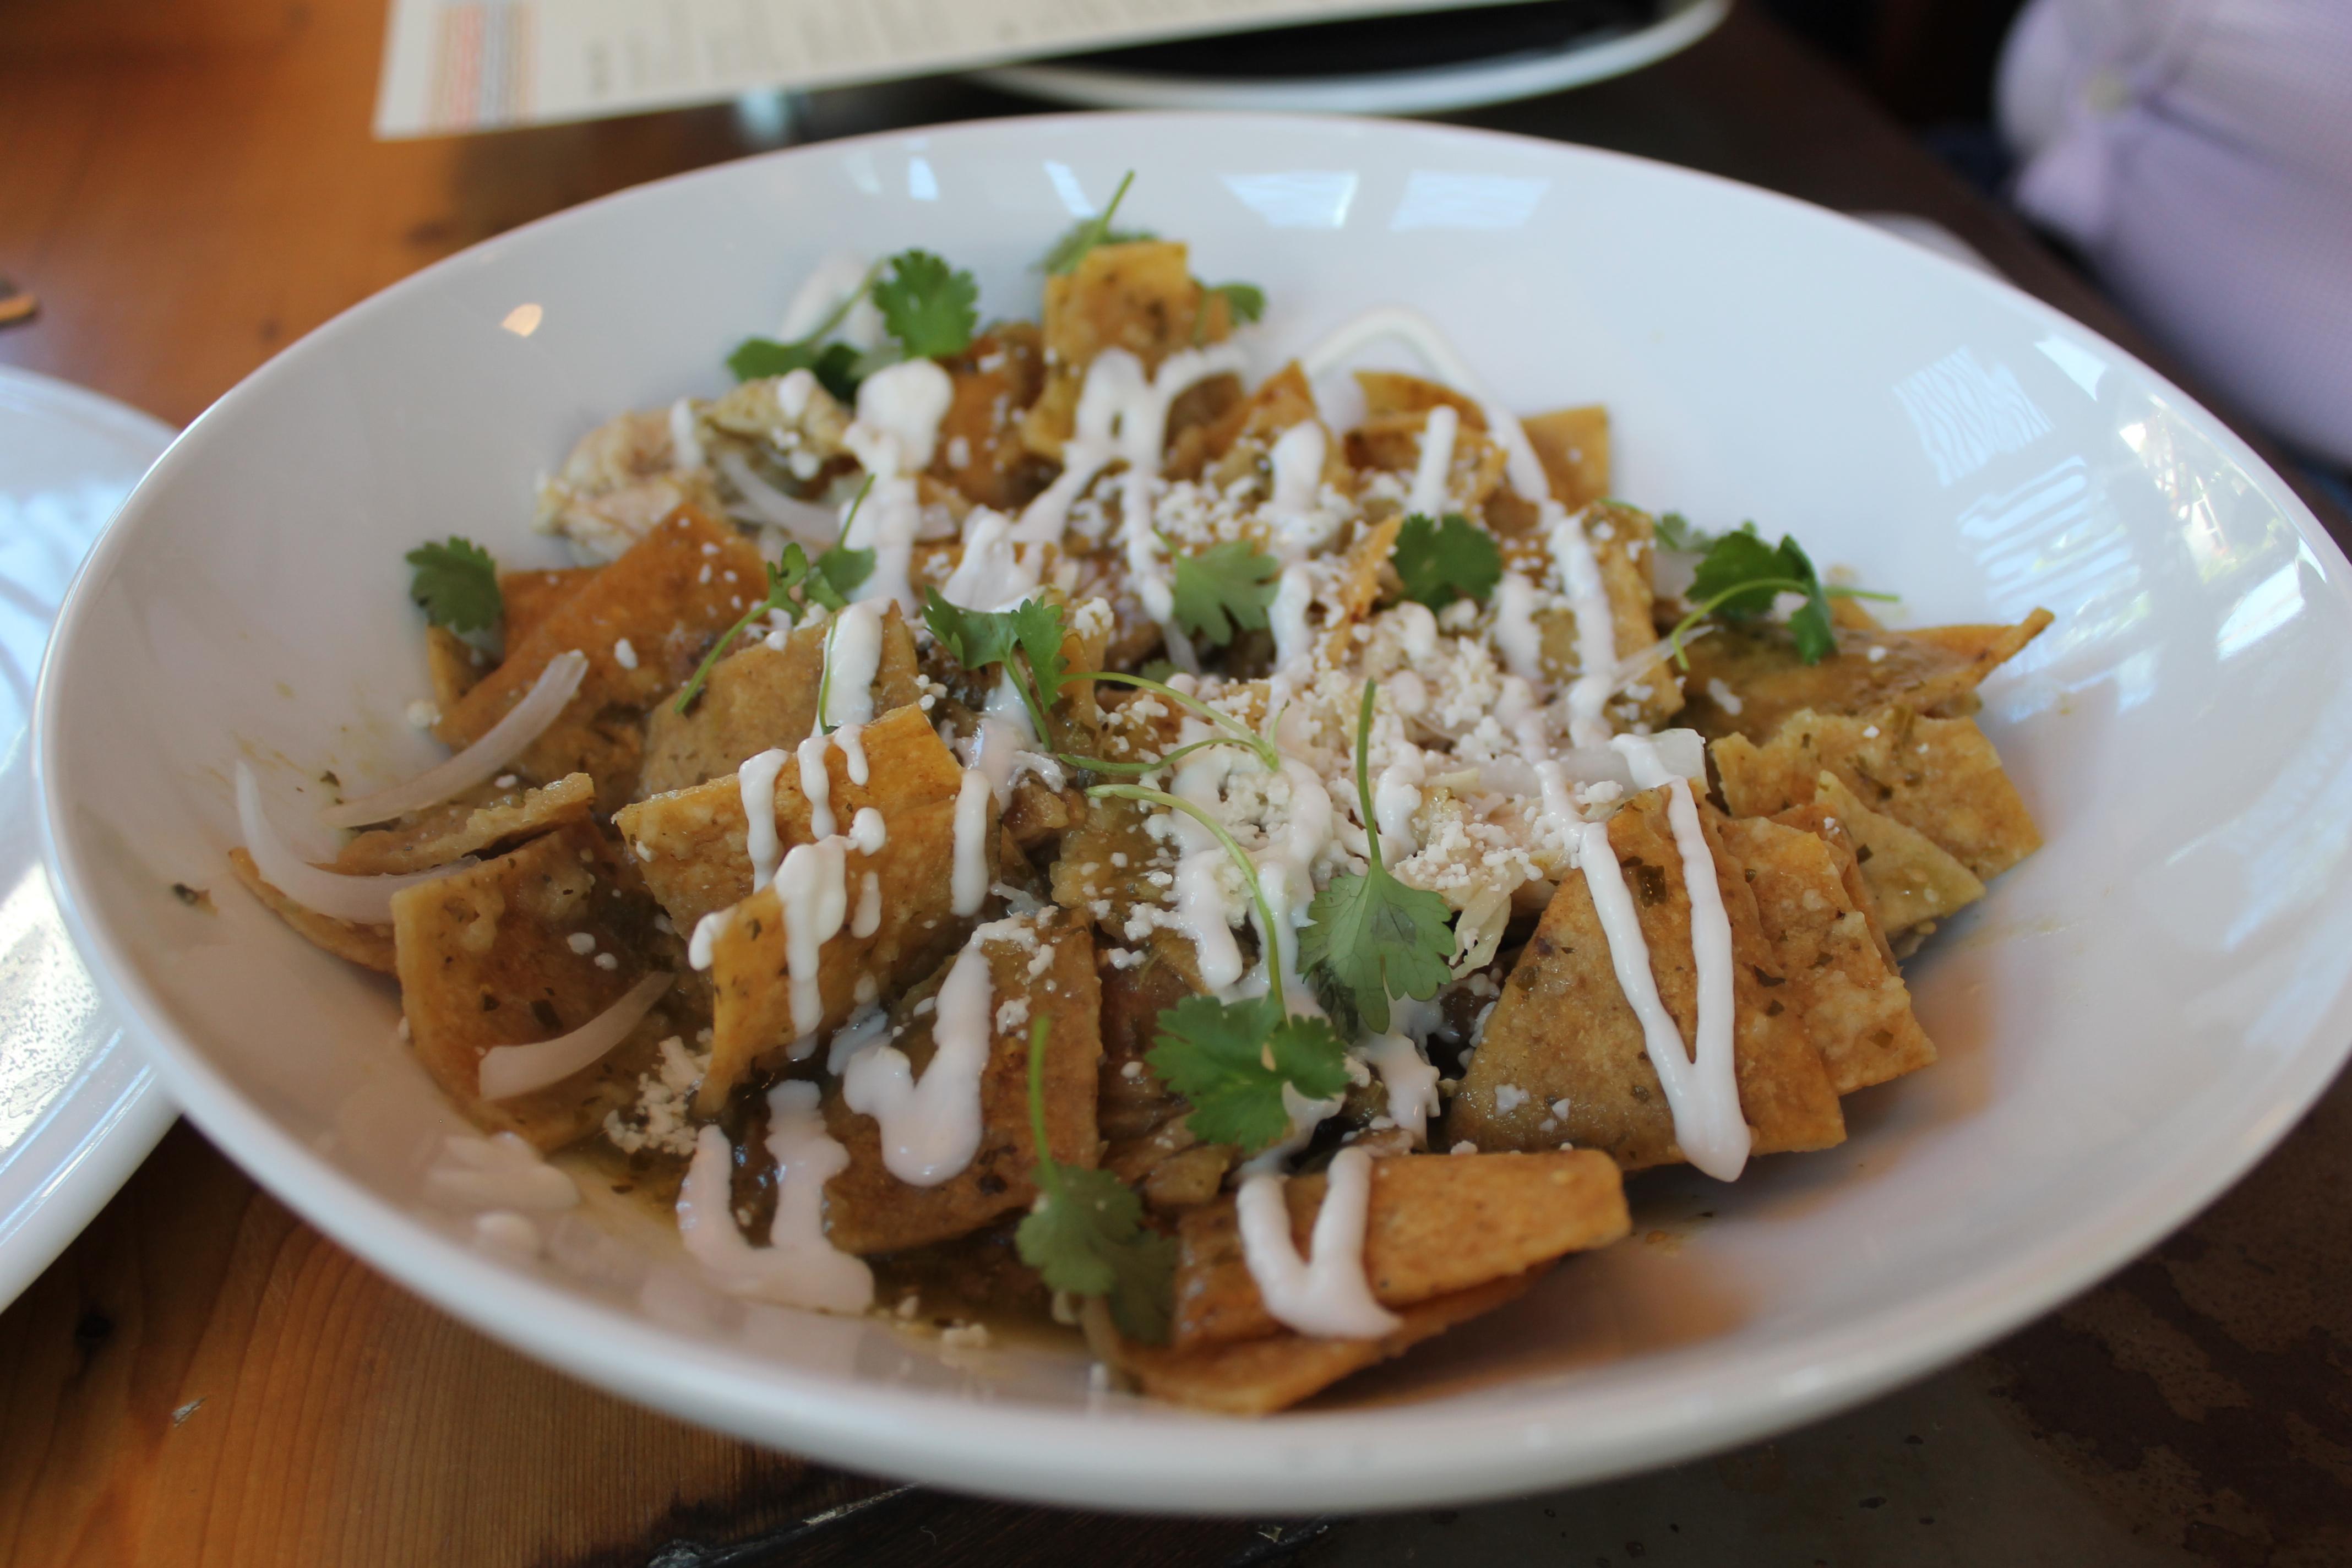 Chilaquiles from Nao Latin Gastro Pub. Photo courtesy of San Antonio Detours.